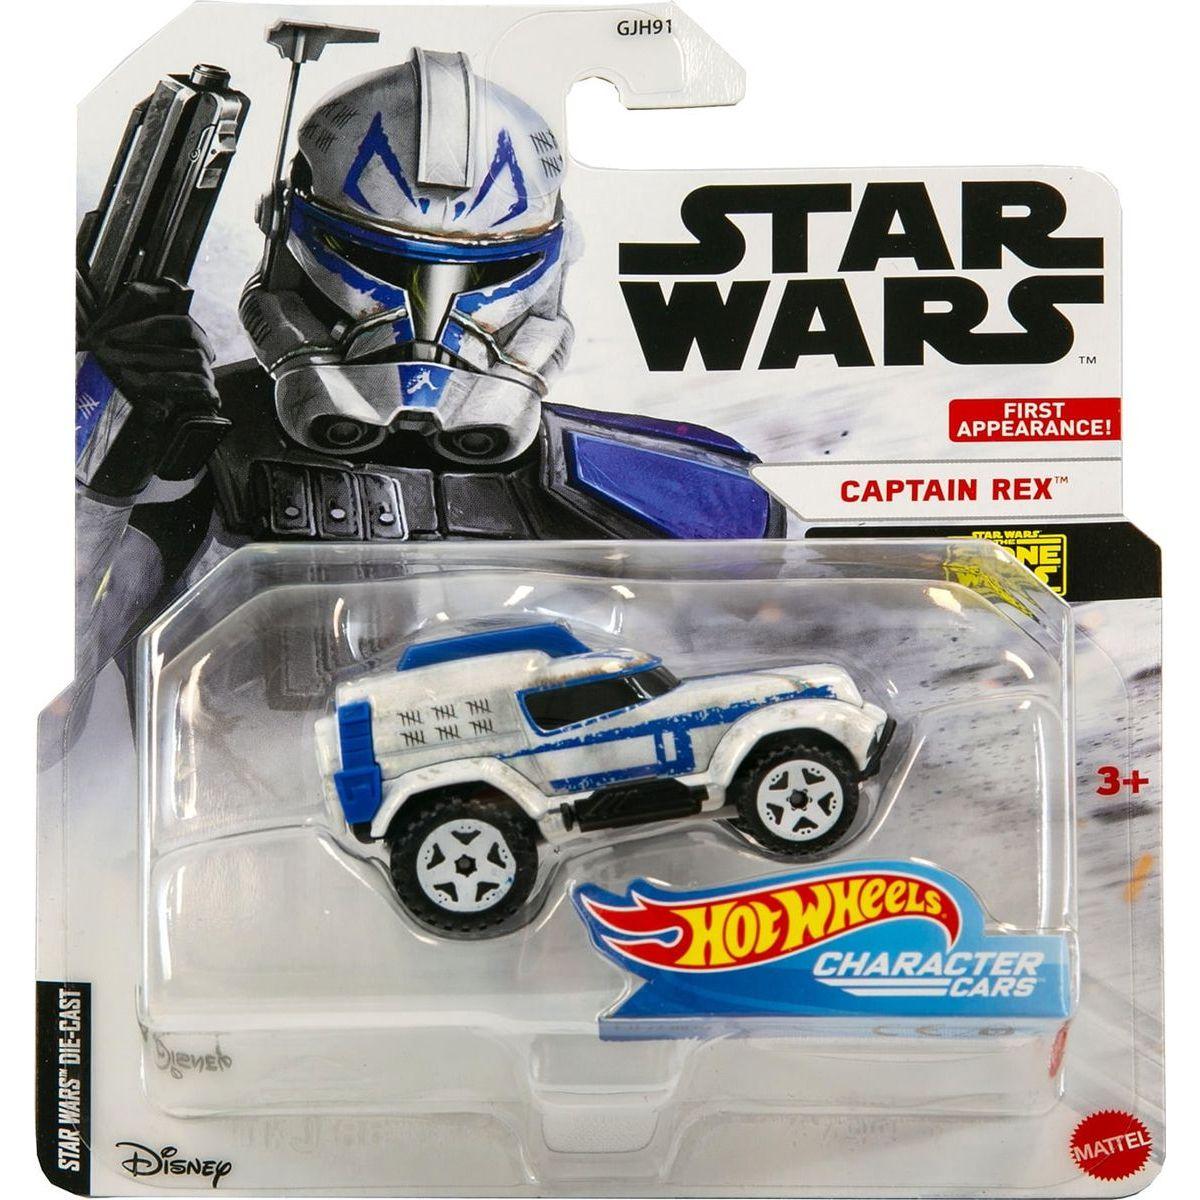 Hot Wheels Star Wars Character Cars Captain Rex